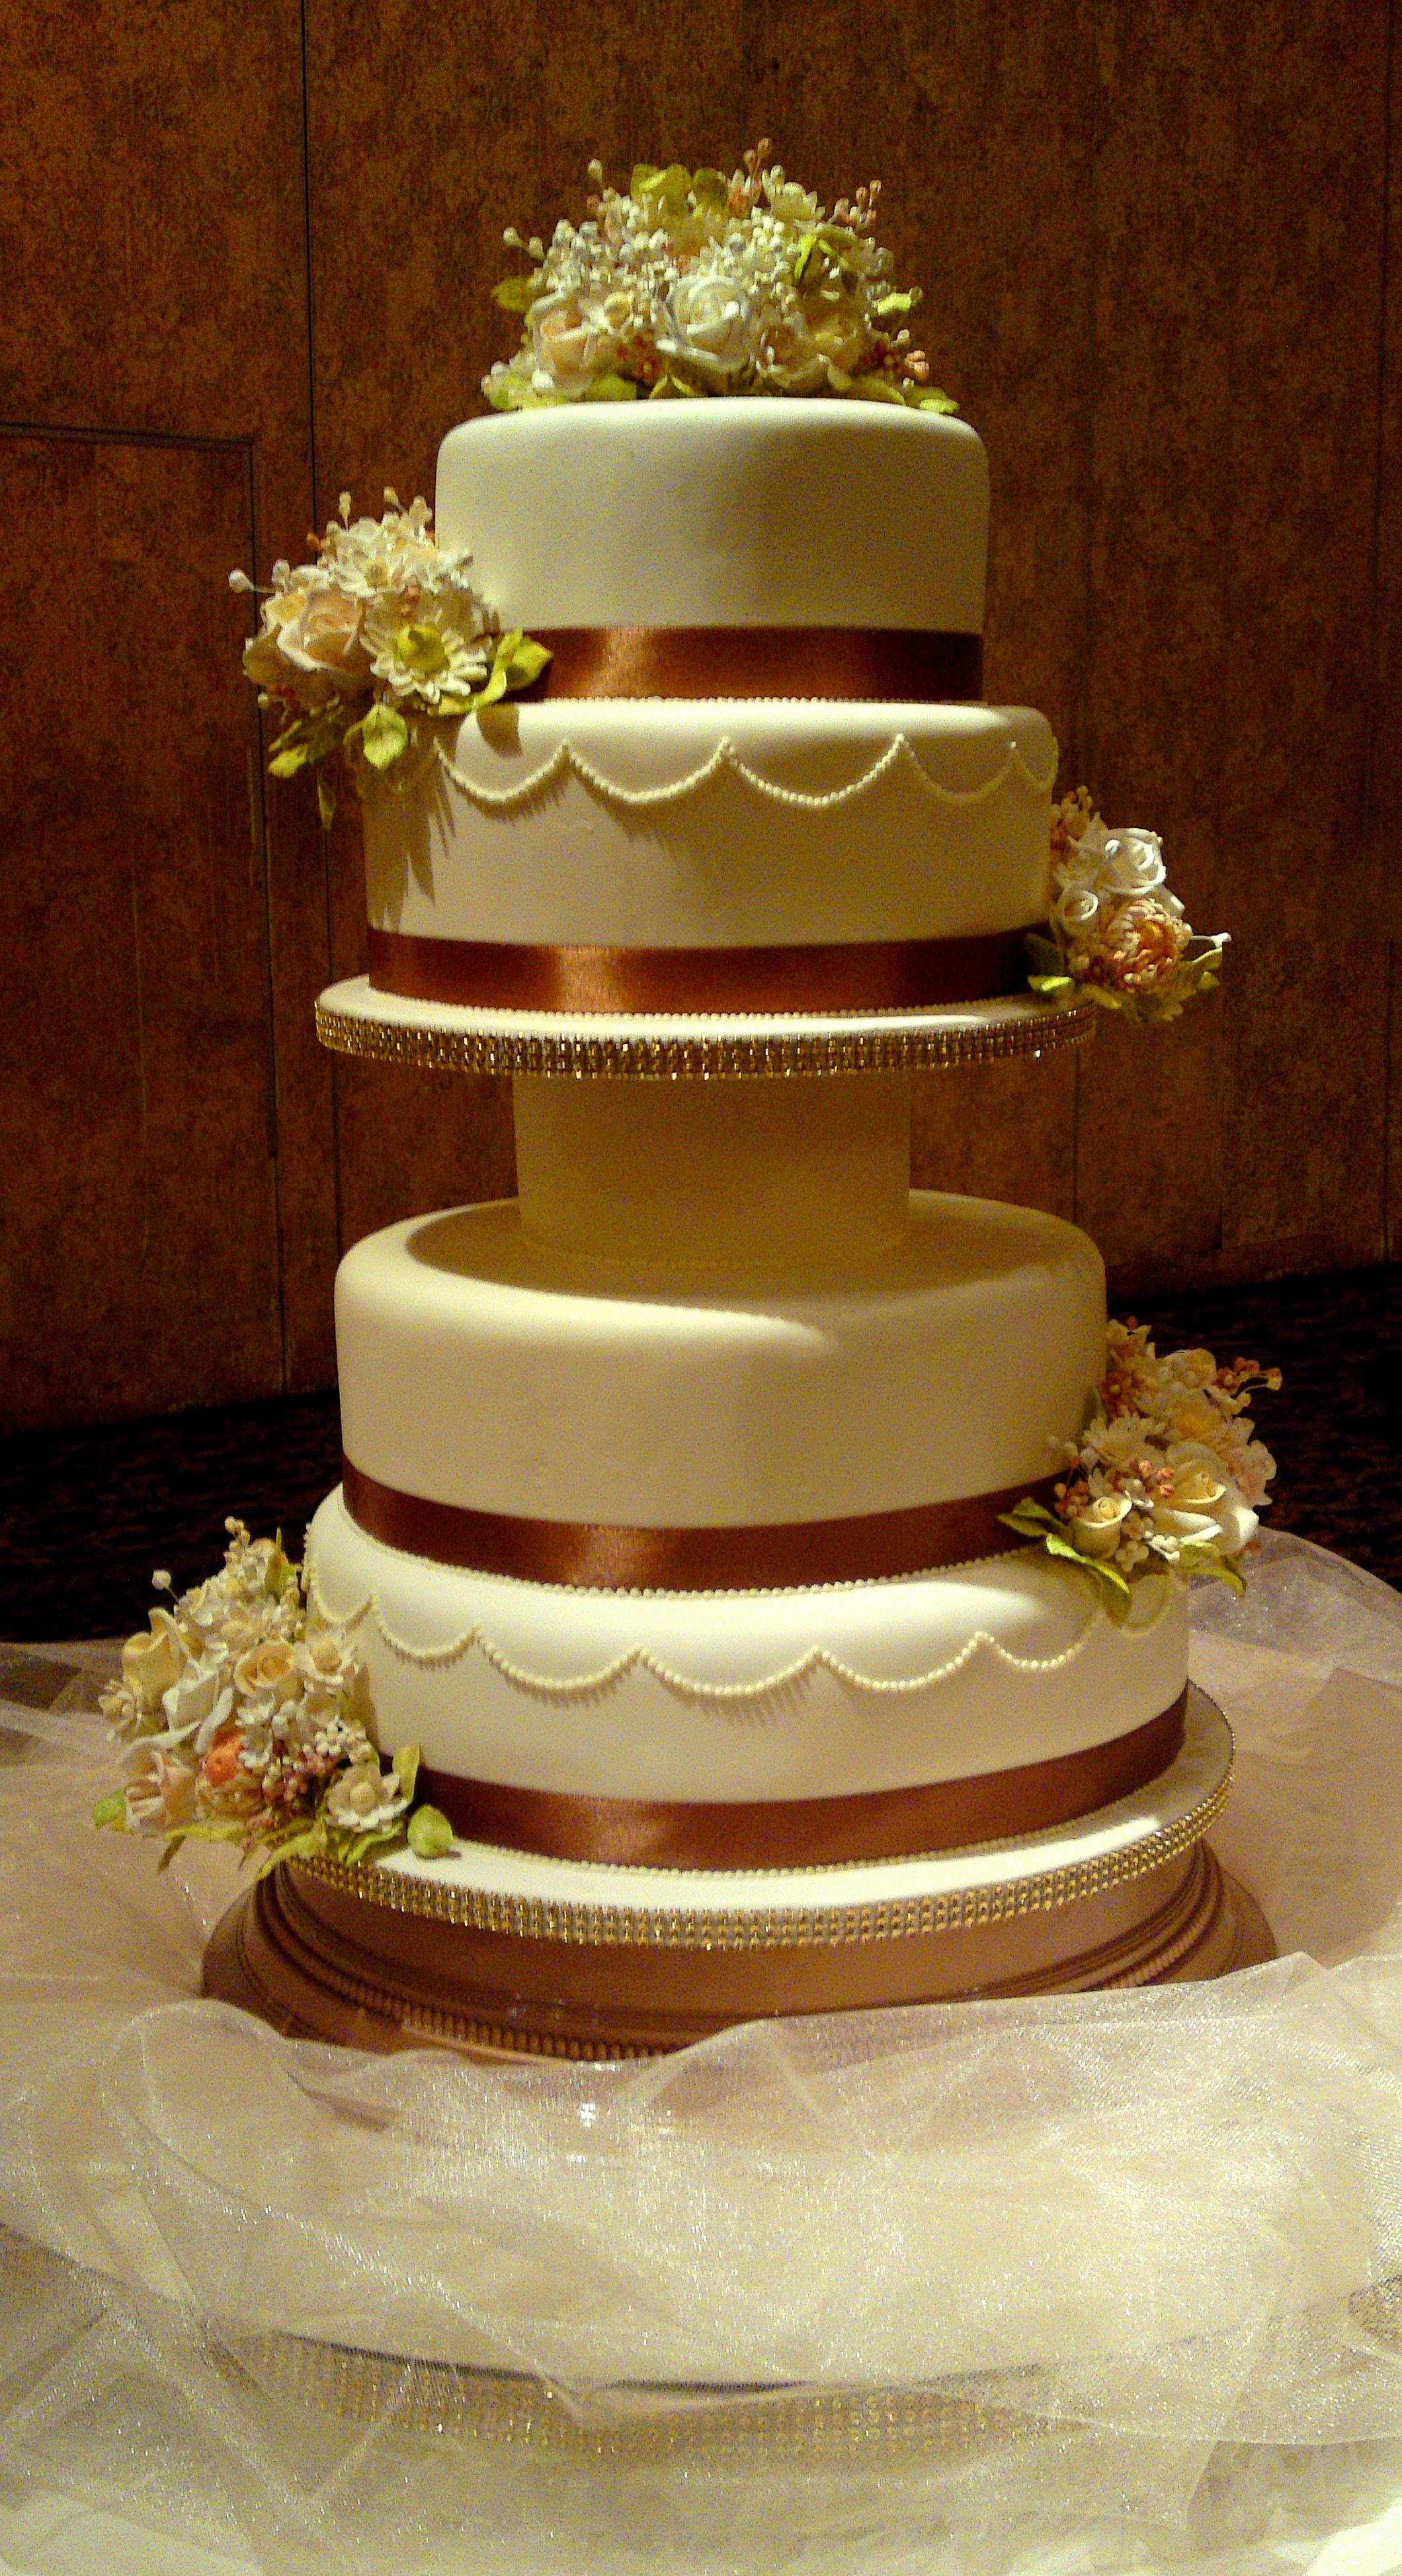 a cake for Ganga